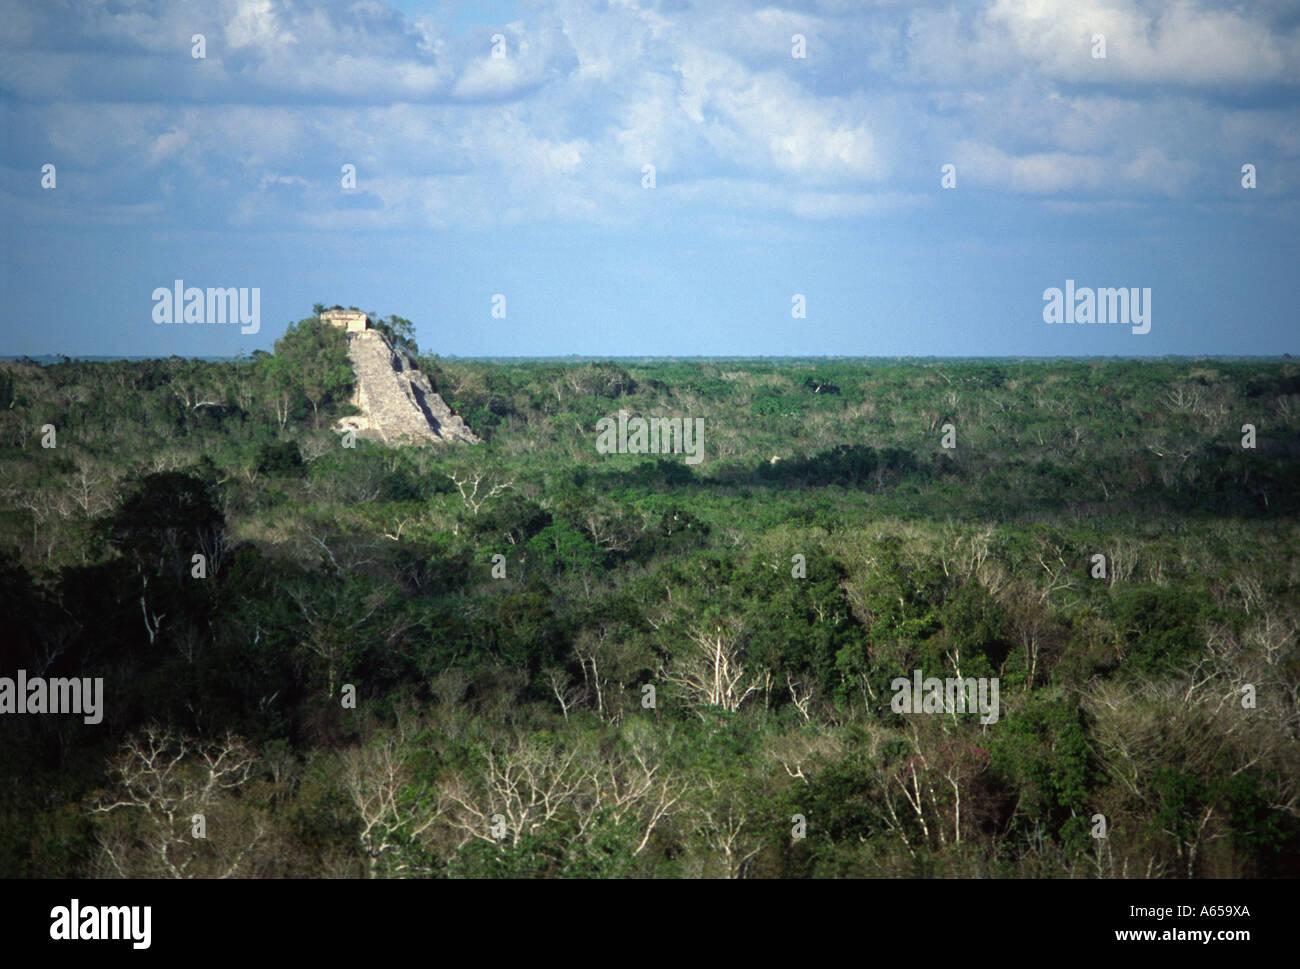 Mayan pyramid ruin surrounded by forest, ancient city of Coba, Yucatan Peninsula, Mexico - Stock Image